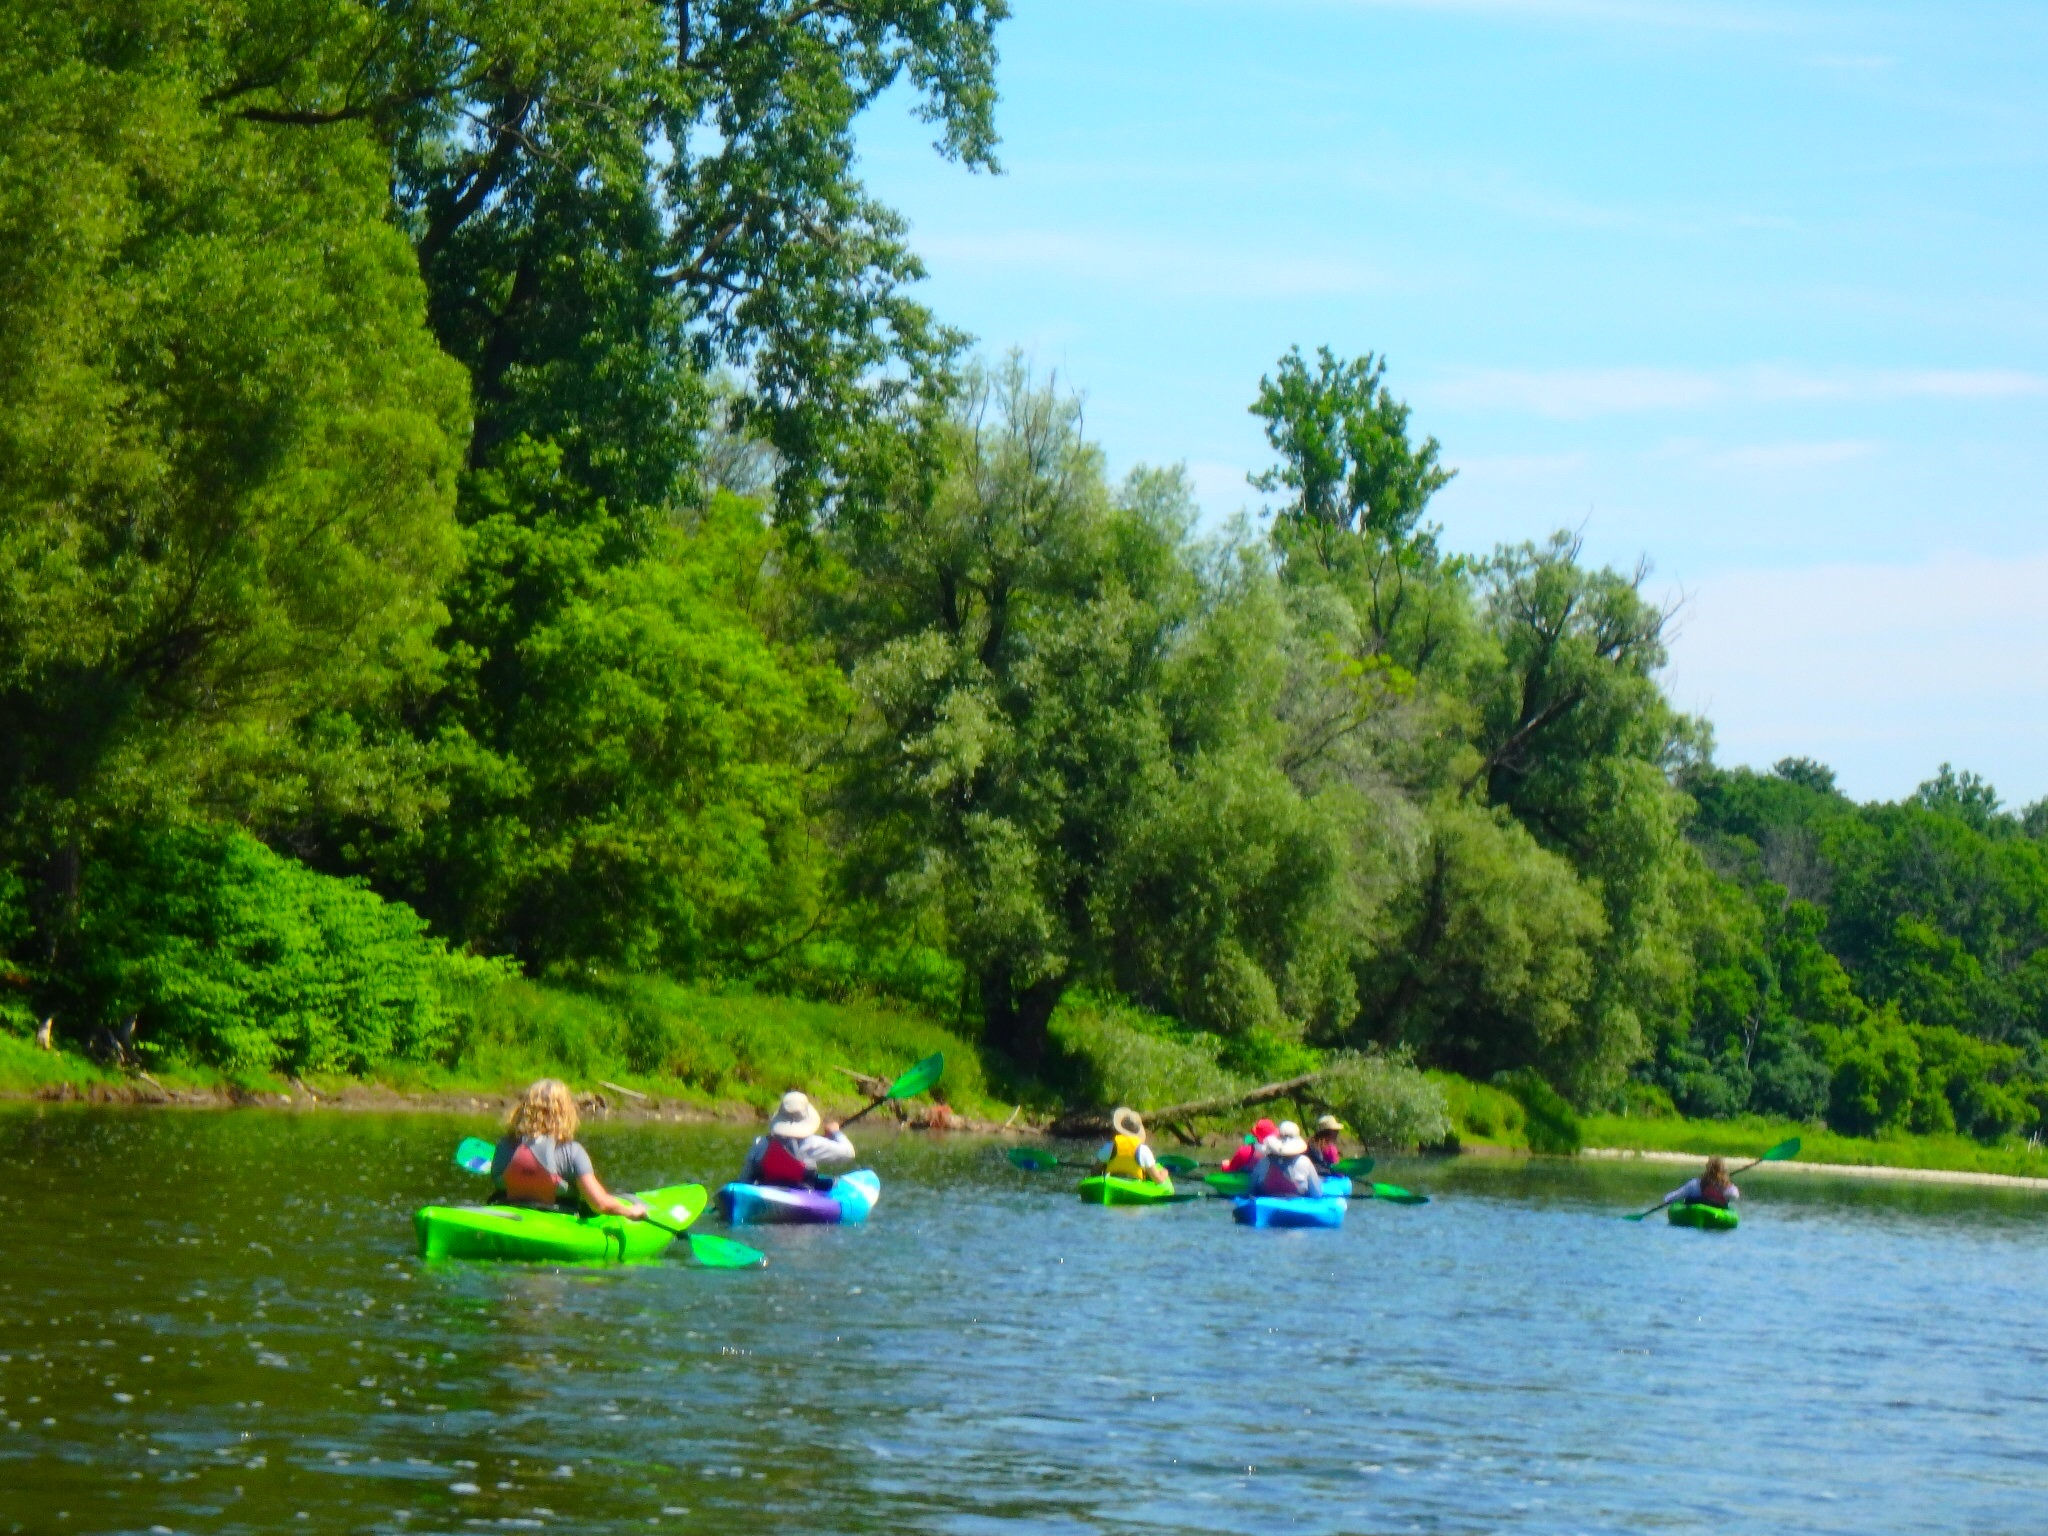 Kayaking Yoga Meditation - Solstice - Jun 21 2018-63